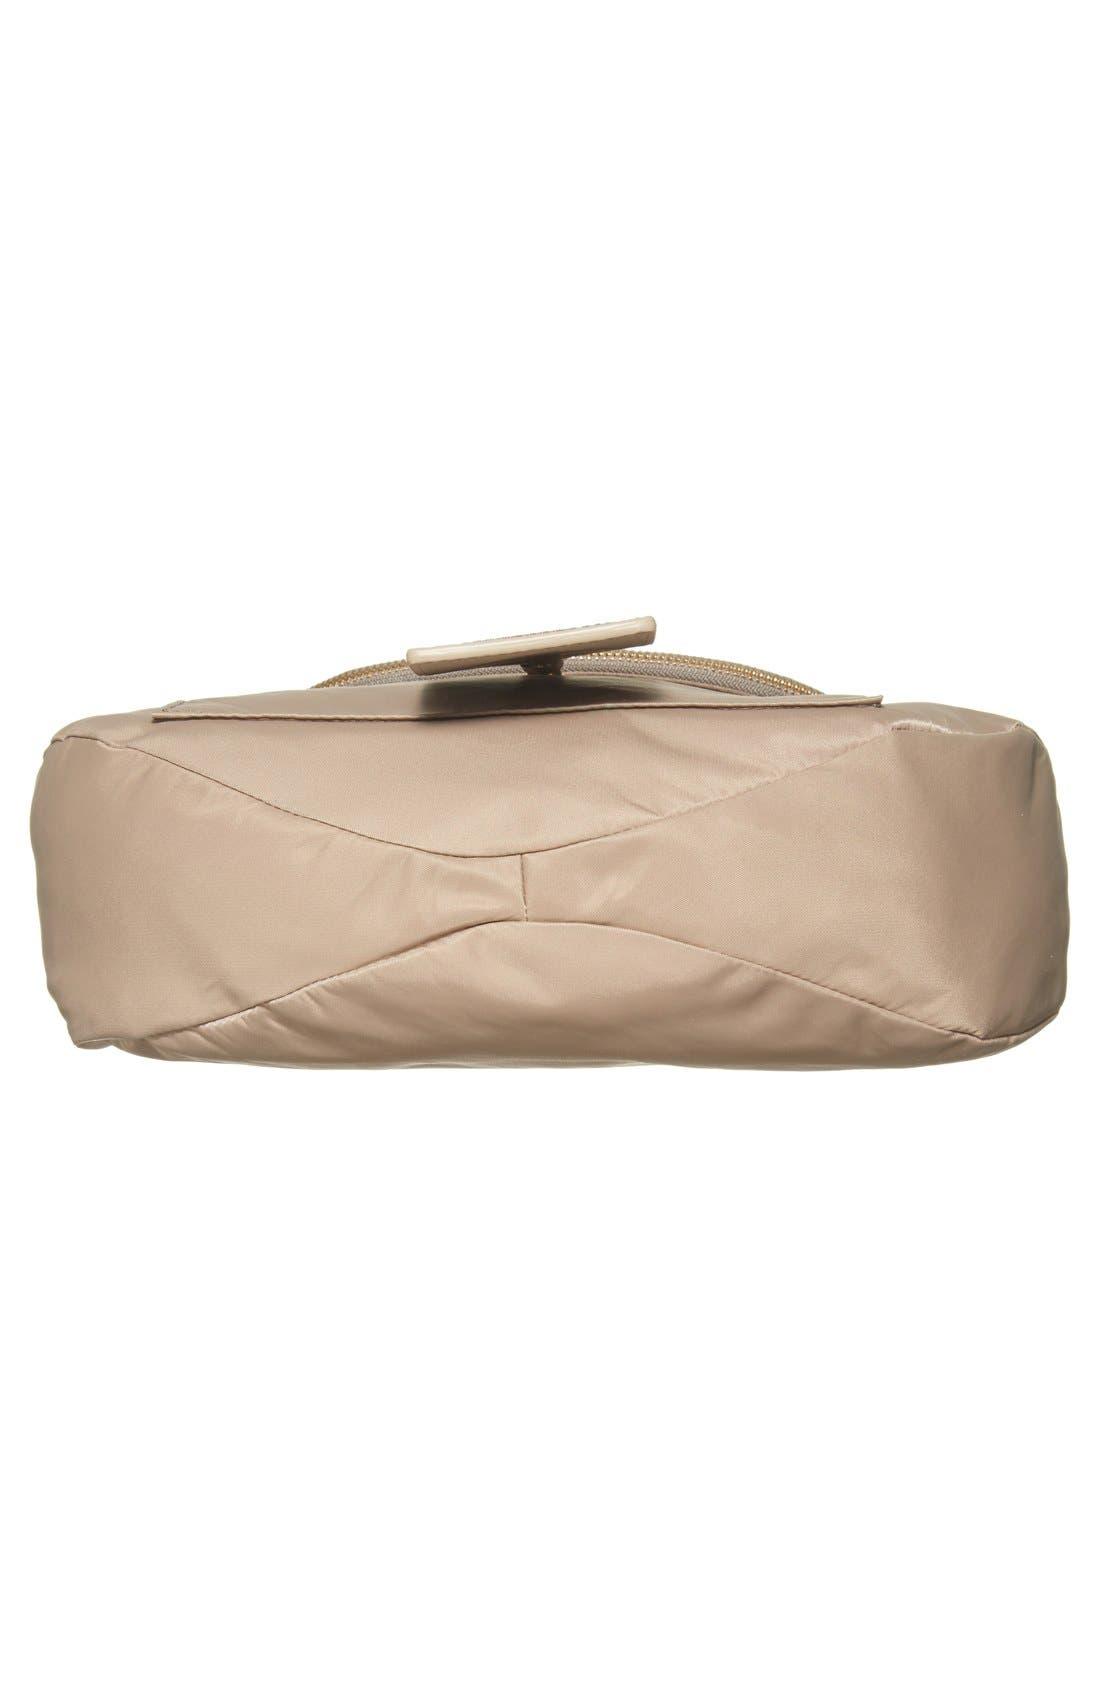 Alternate Image 3  - MARC BY MARC JACOBS ' Preppy Nylon - Natasha' Crossbody Bag